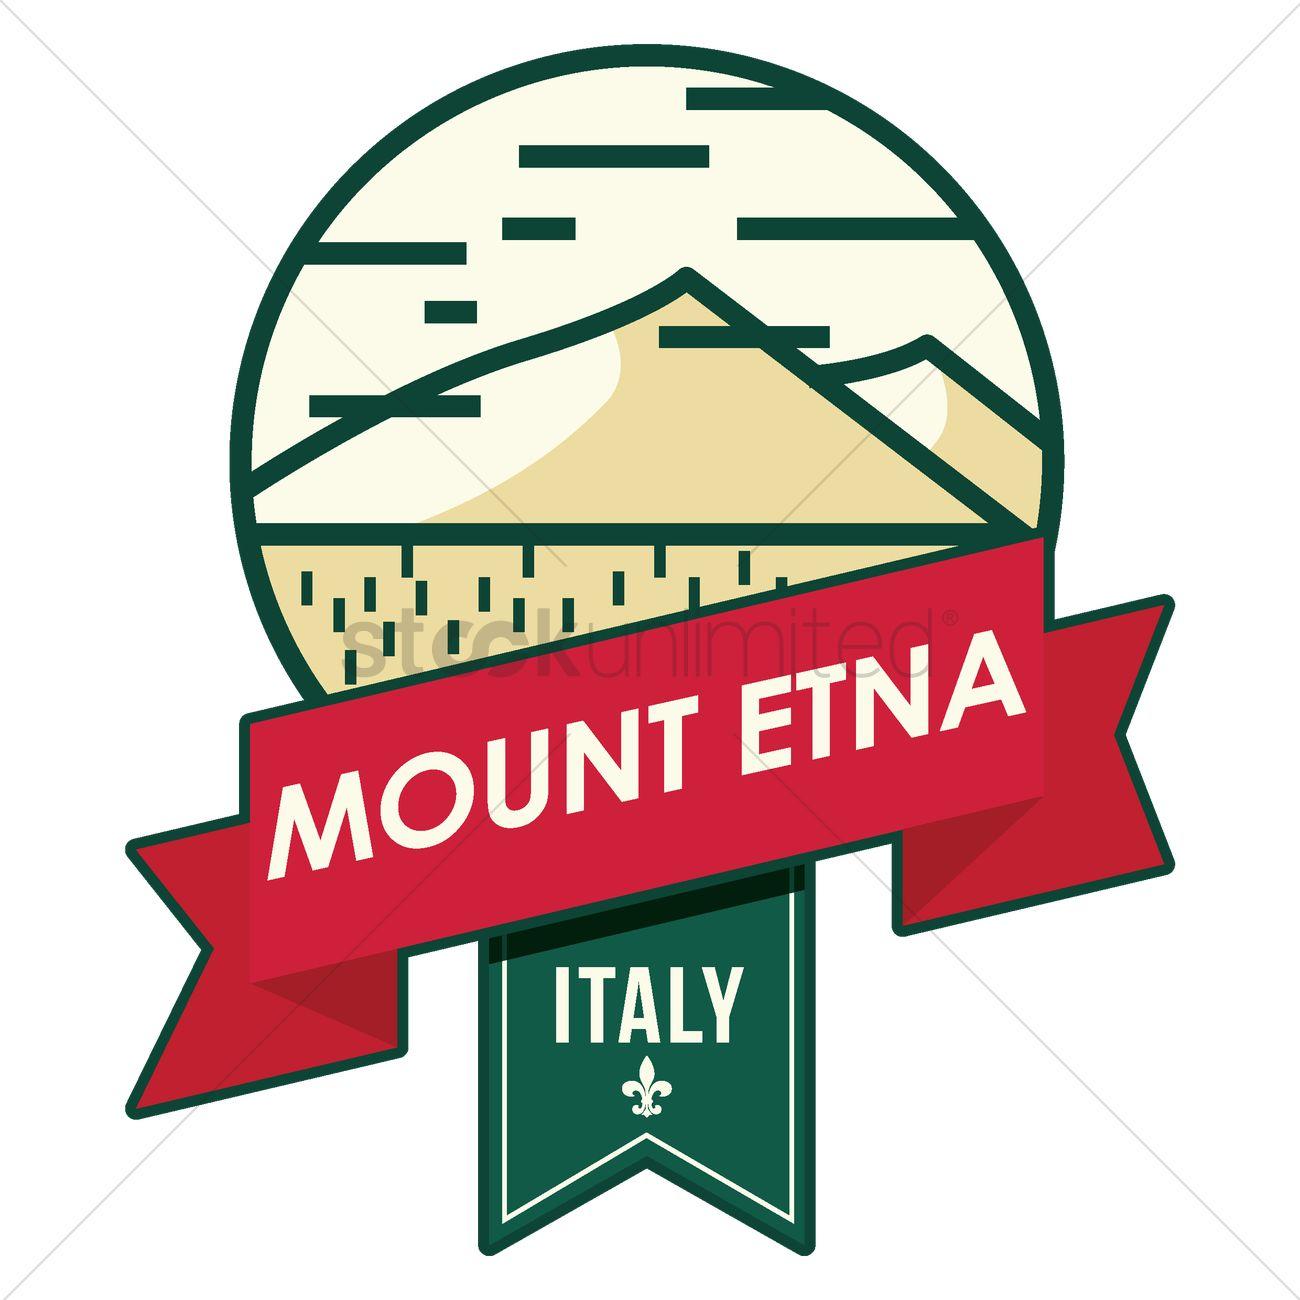 Mount etna clipart #4